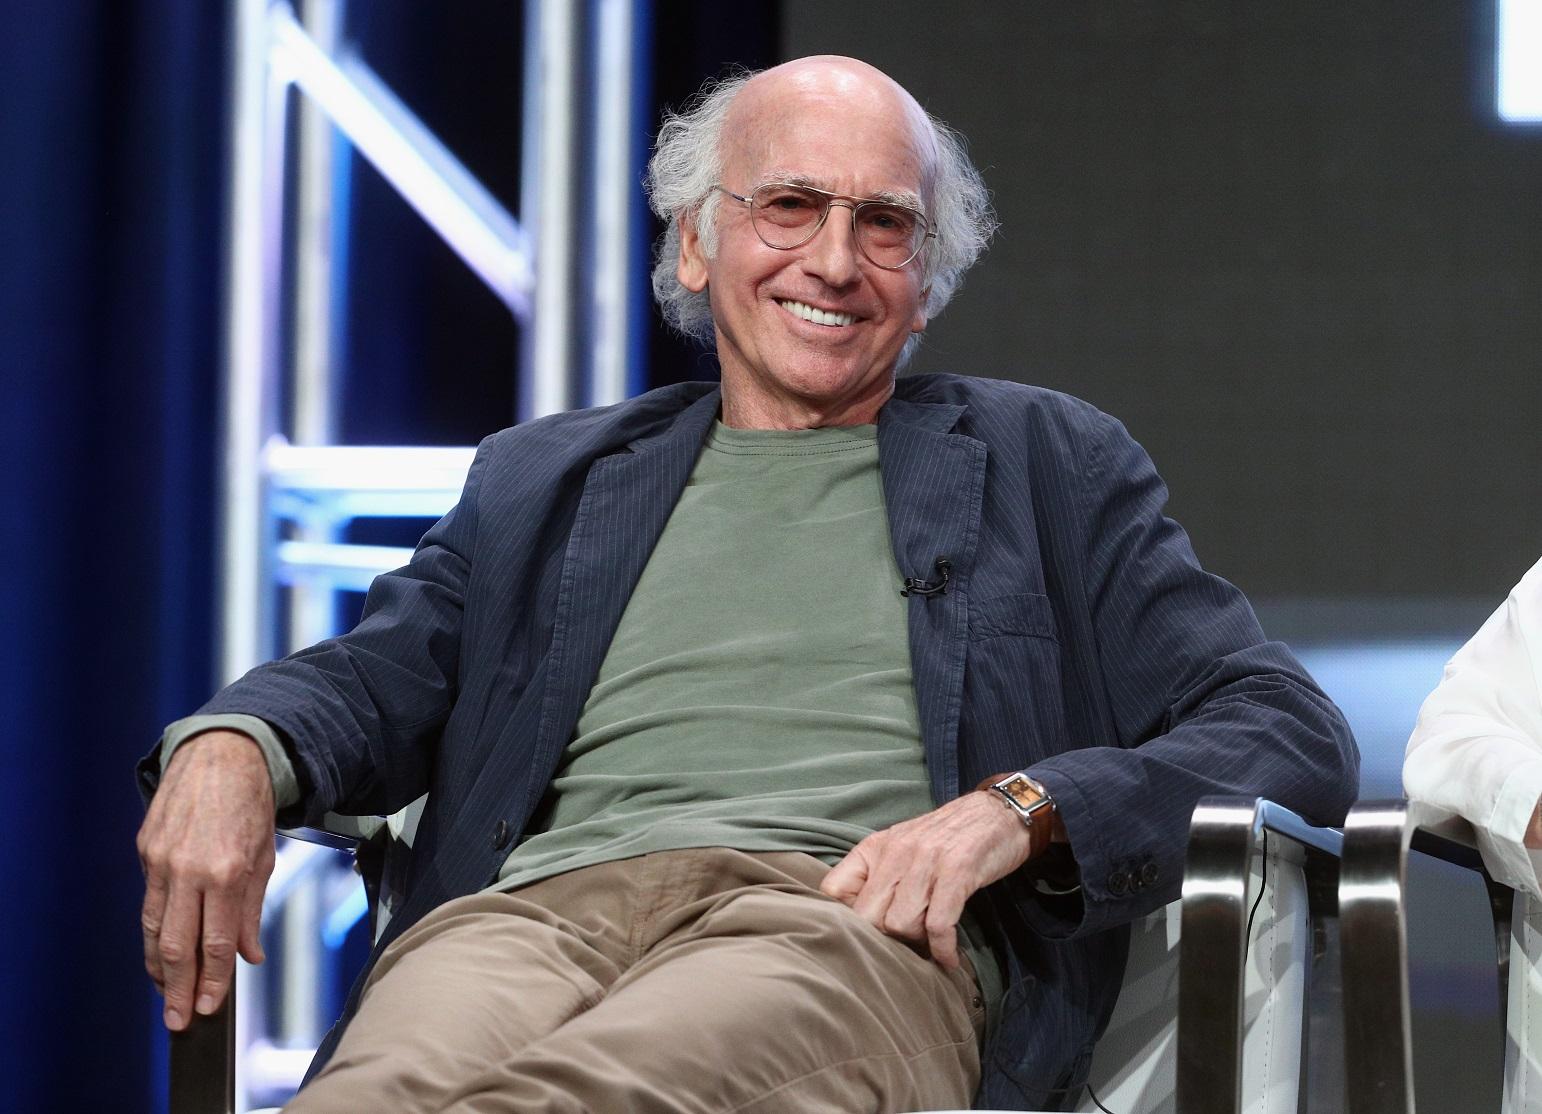 Larry David Wealth